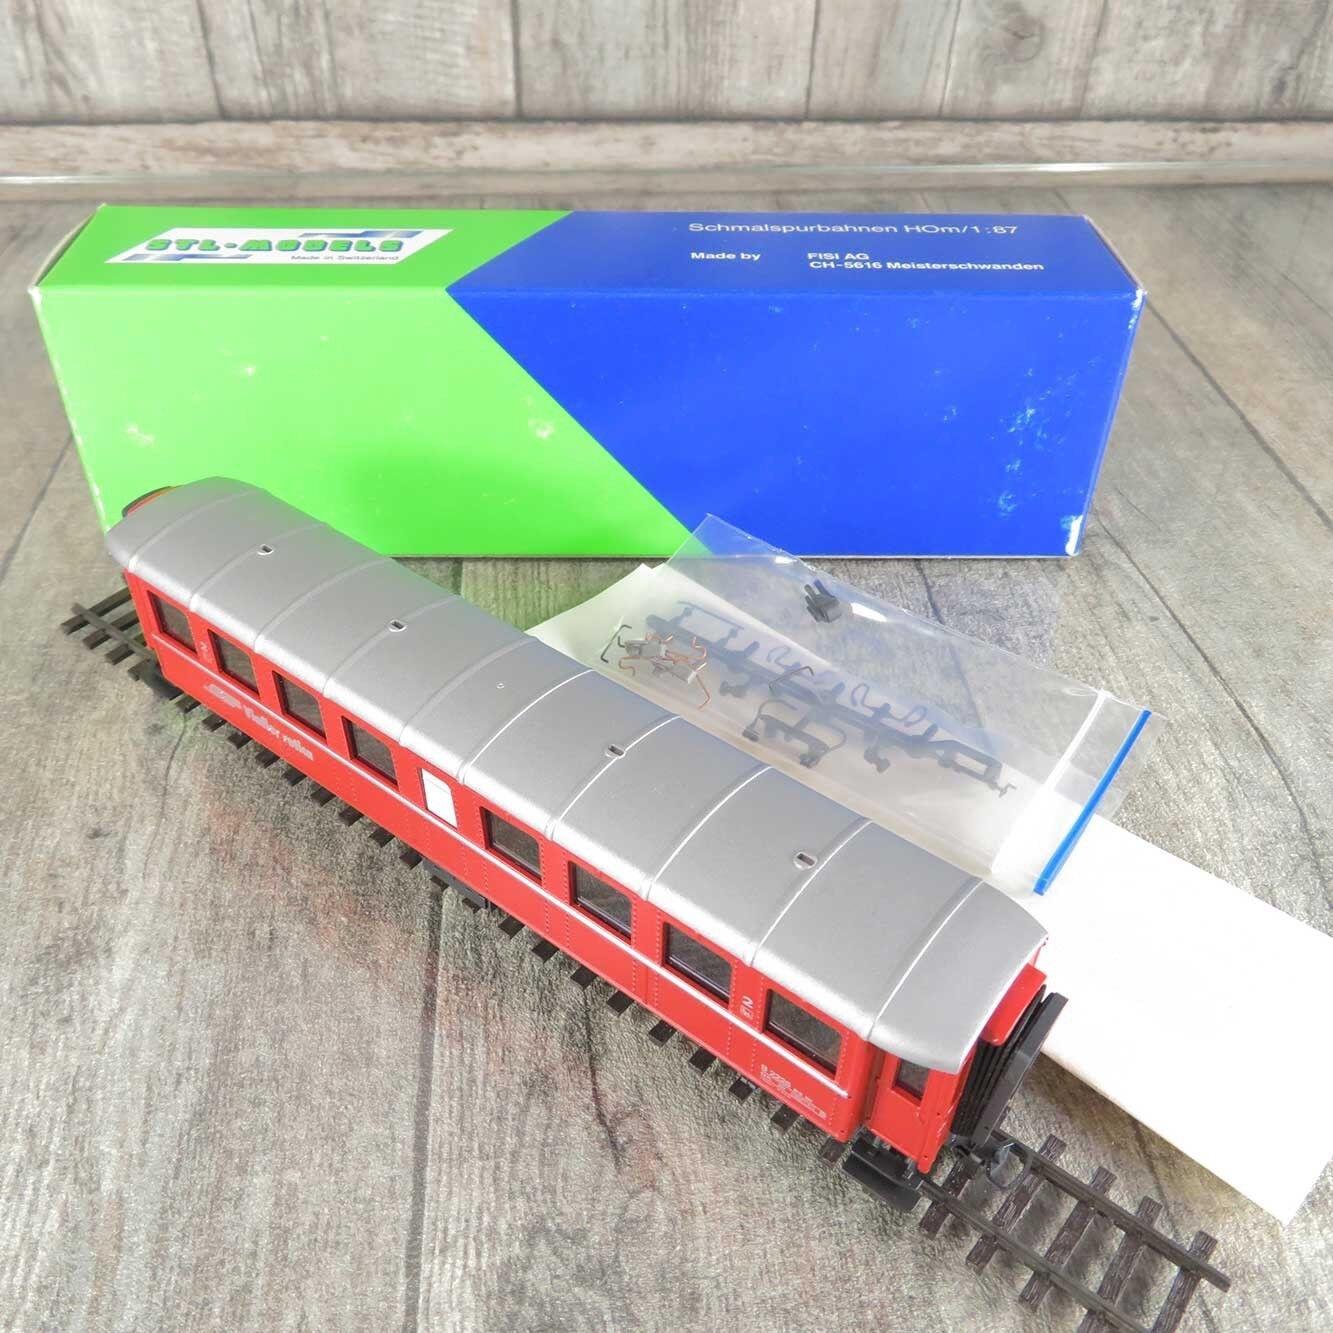 STL-Models 2202/5 - H0m - Personenwagen - RhB - 2.Kl. - OVP -  C15577